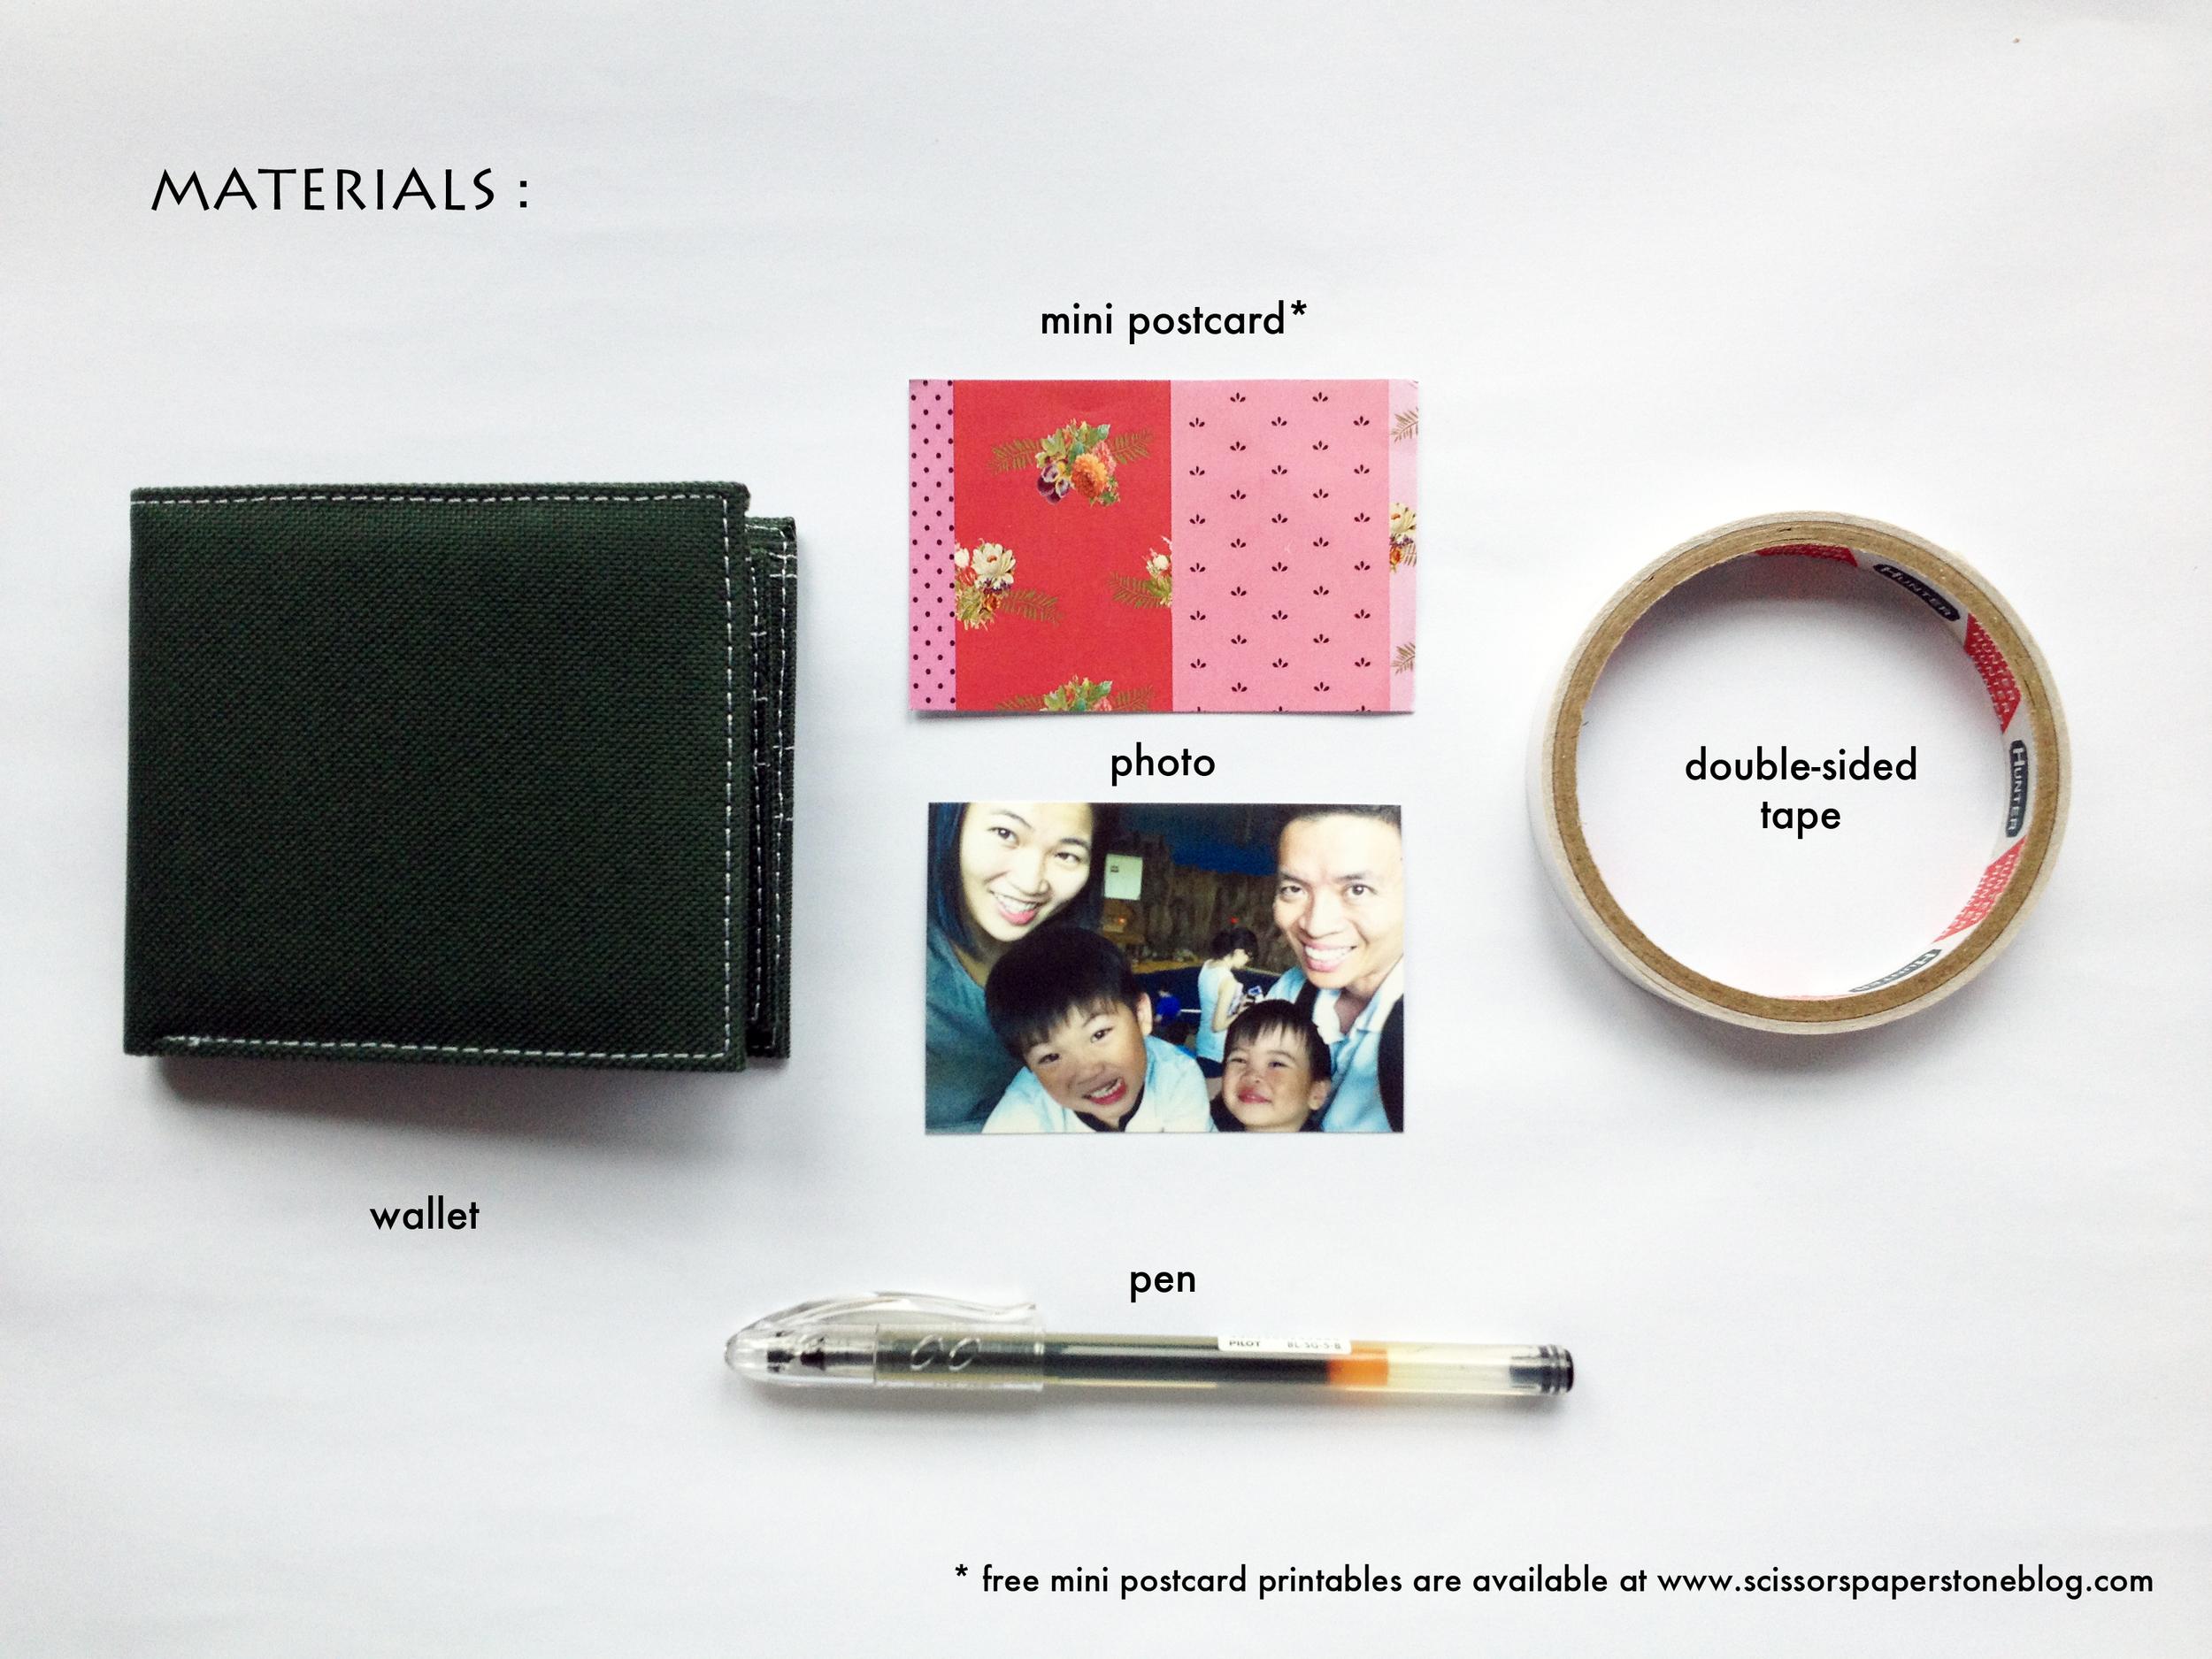 wallet01.jpg